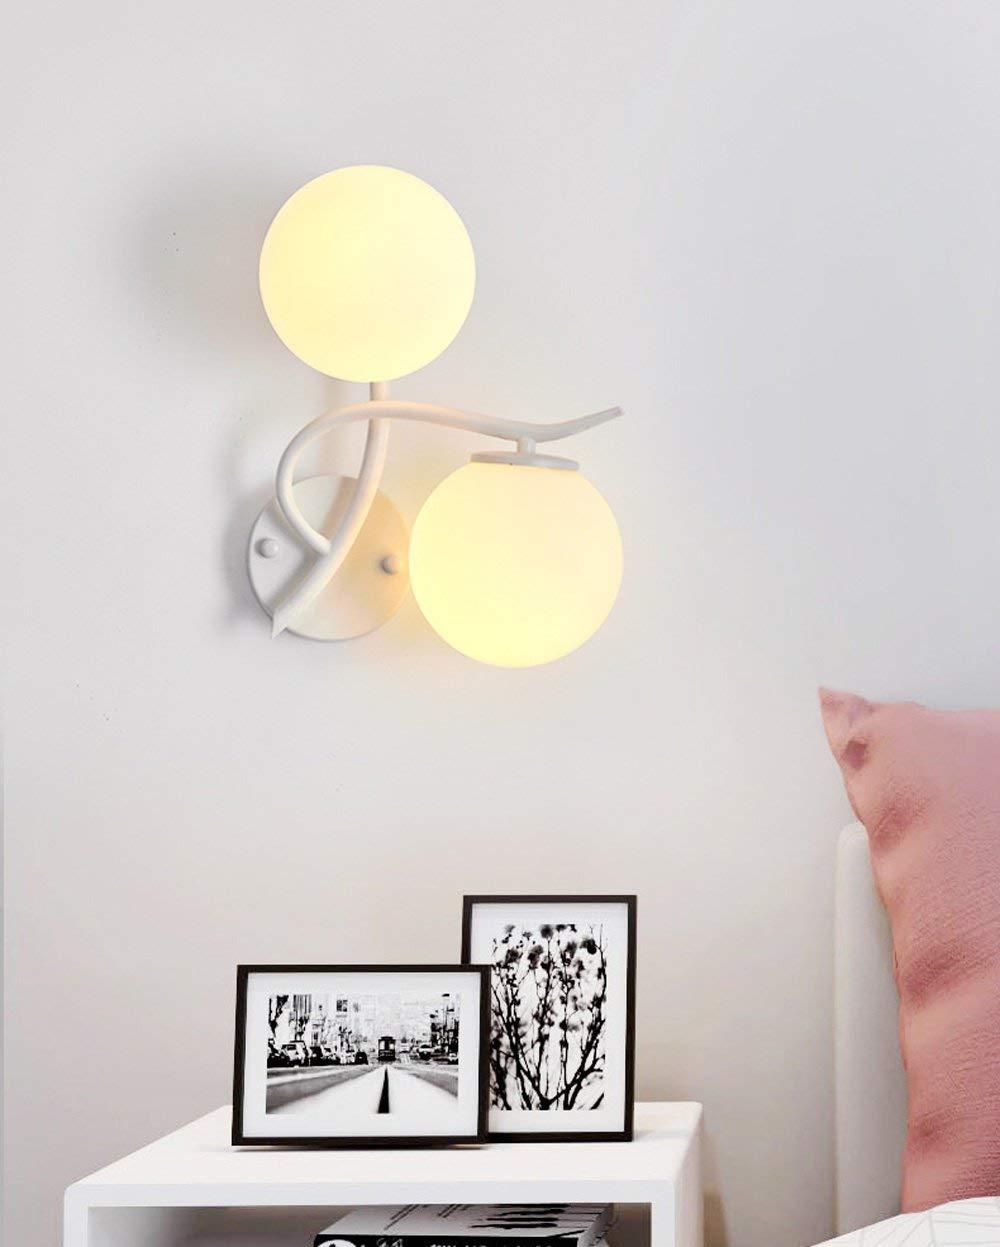 ● Kreativ Einfach Wandleuchte Modern Rustikal Design Wandlampe Schlafzimmer Kinderzimmer Flur Treppen Wohnzimmer Lampe Nachttischlampe Wand Beleuchtung Leuchte Eisen Glassschirm E27 2 Flammig, Weiß ●